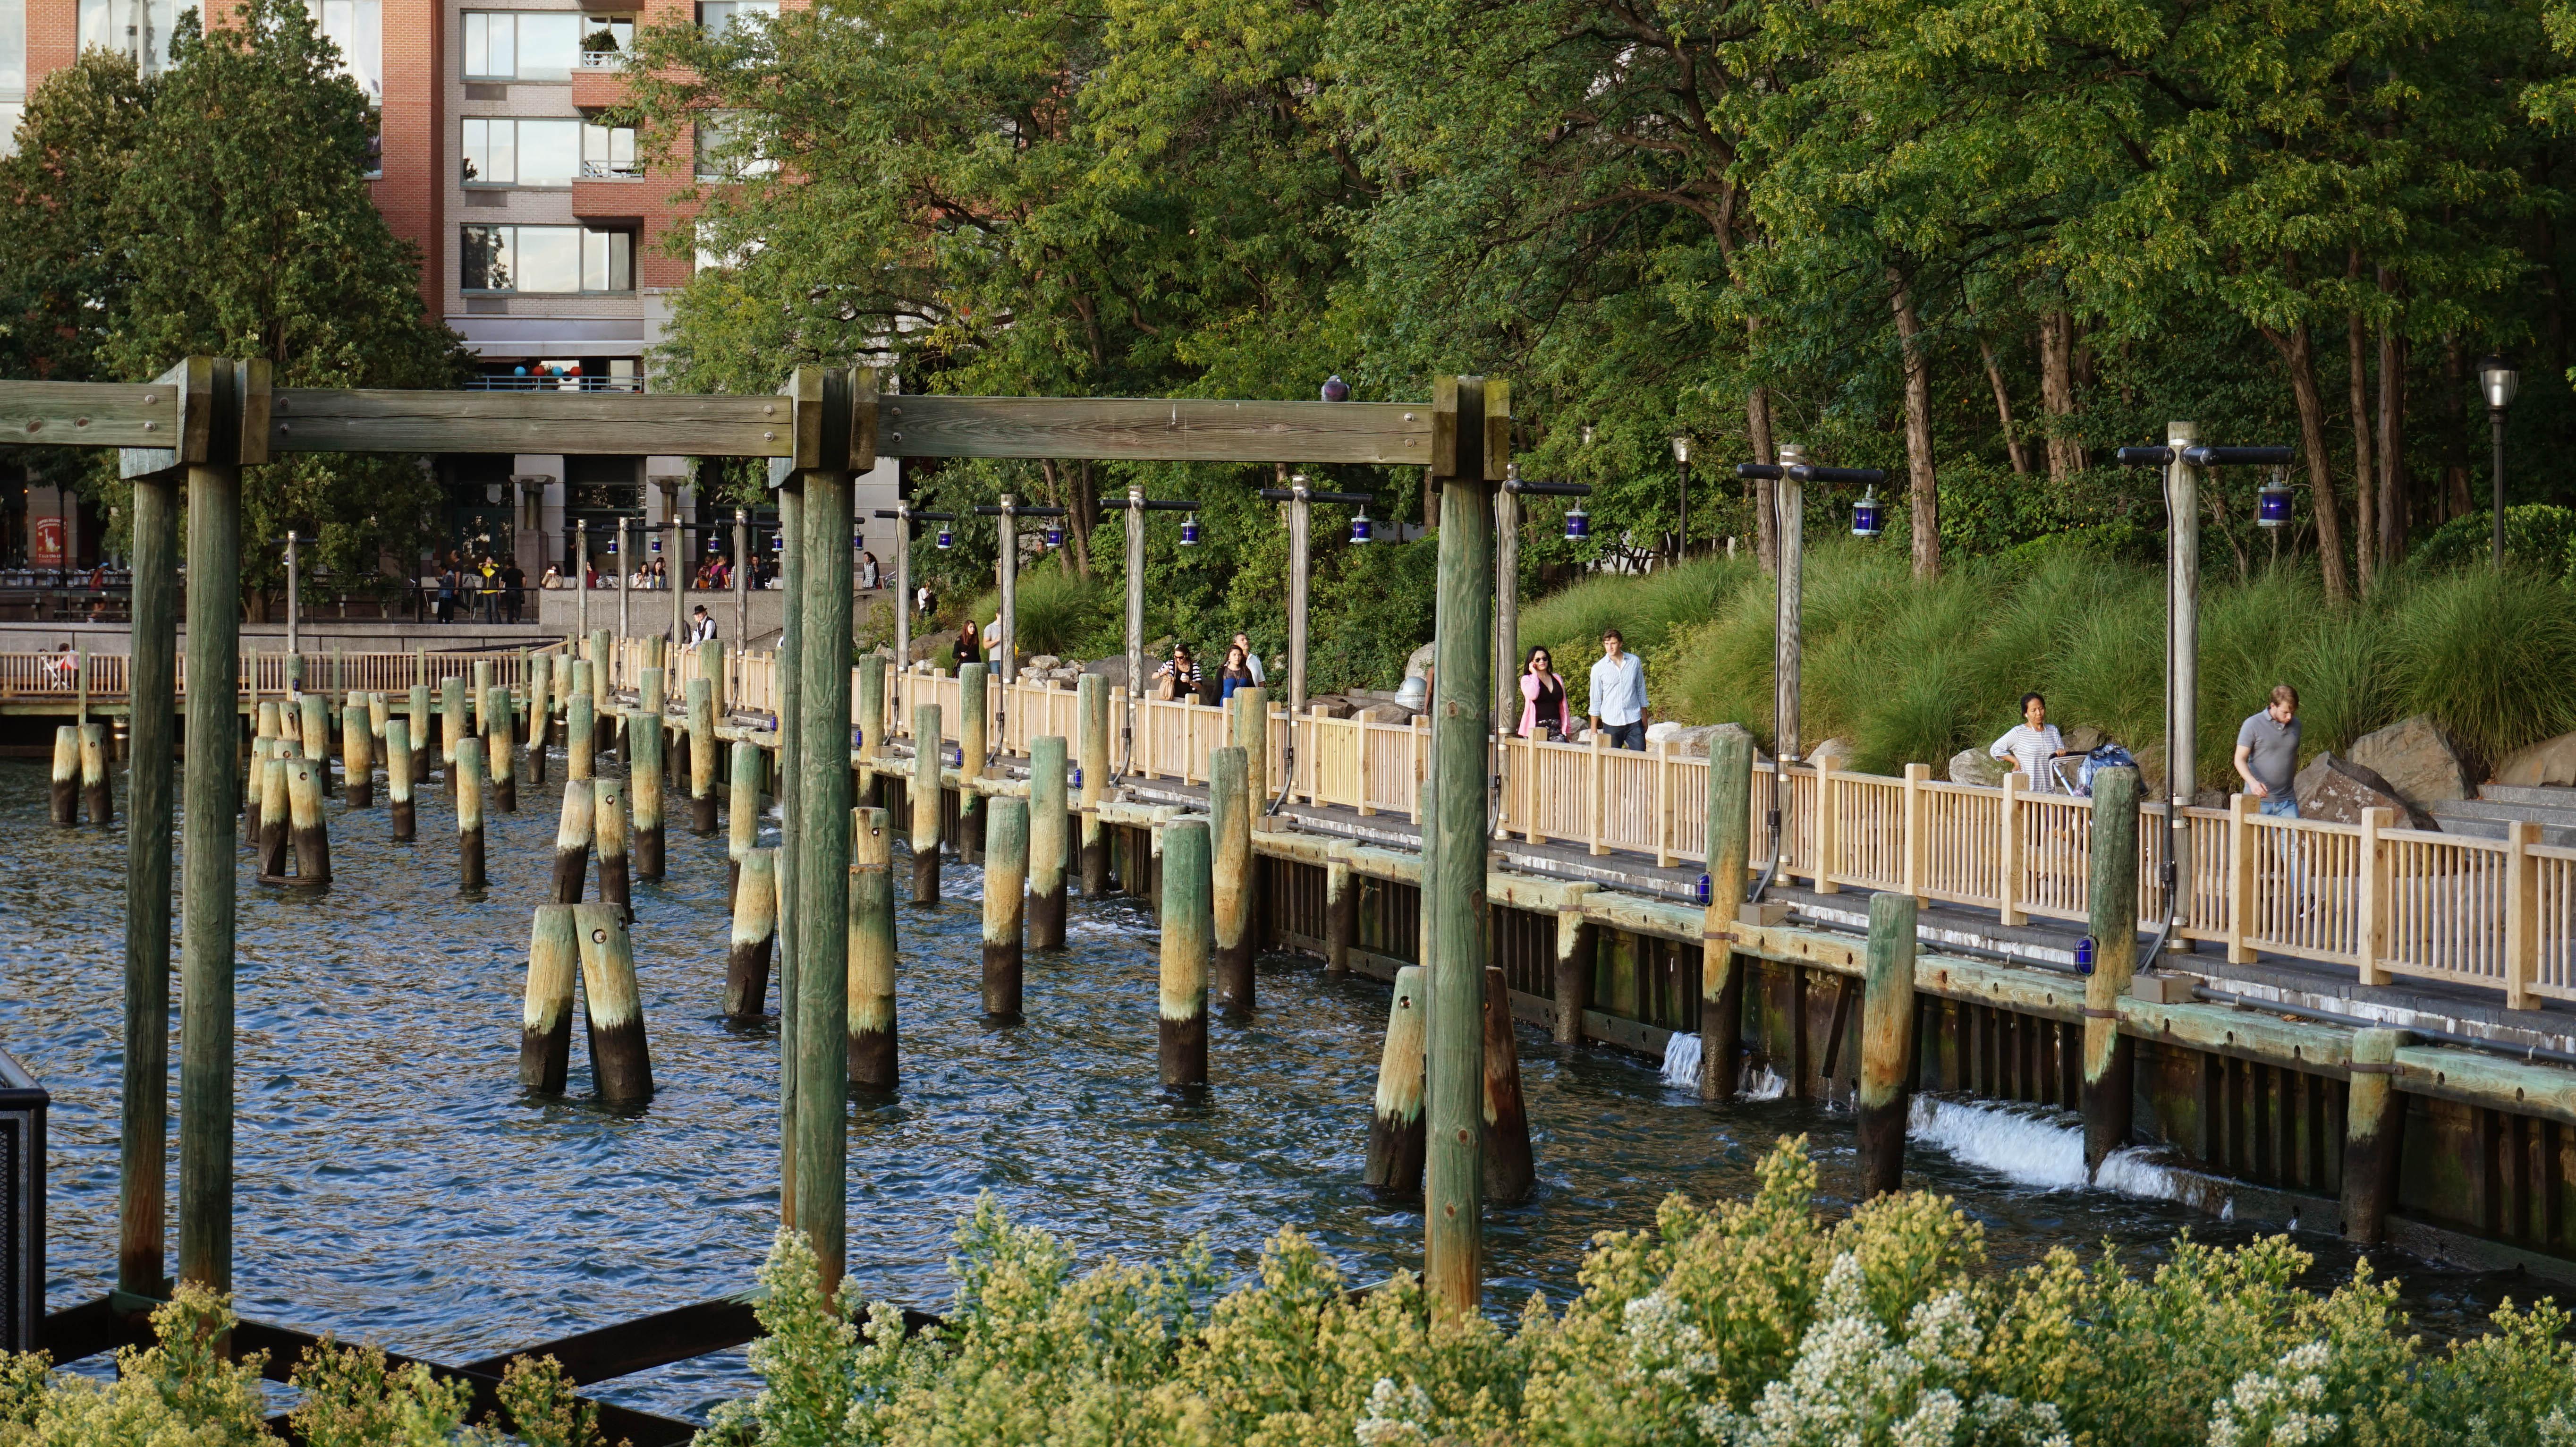 South cove esplanade from bridge 9-17-2014